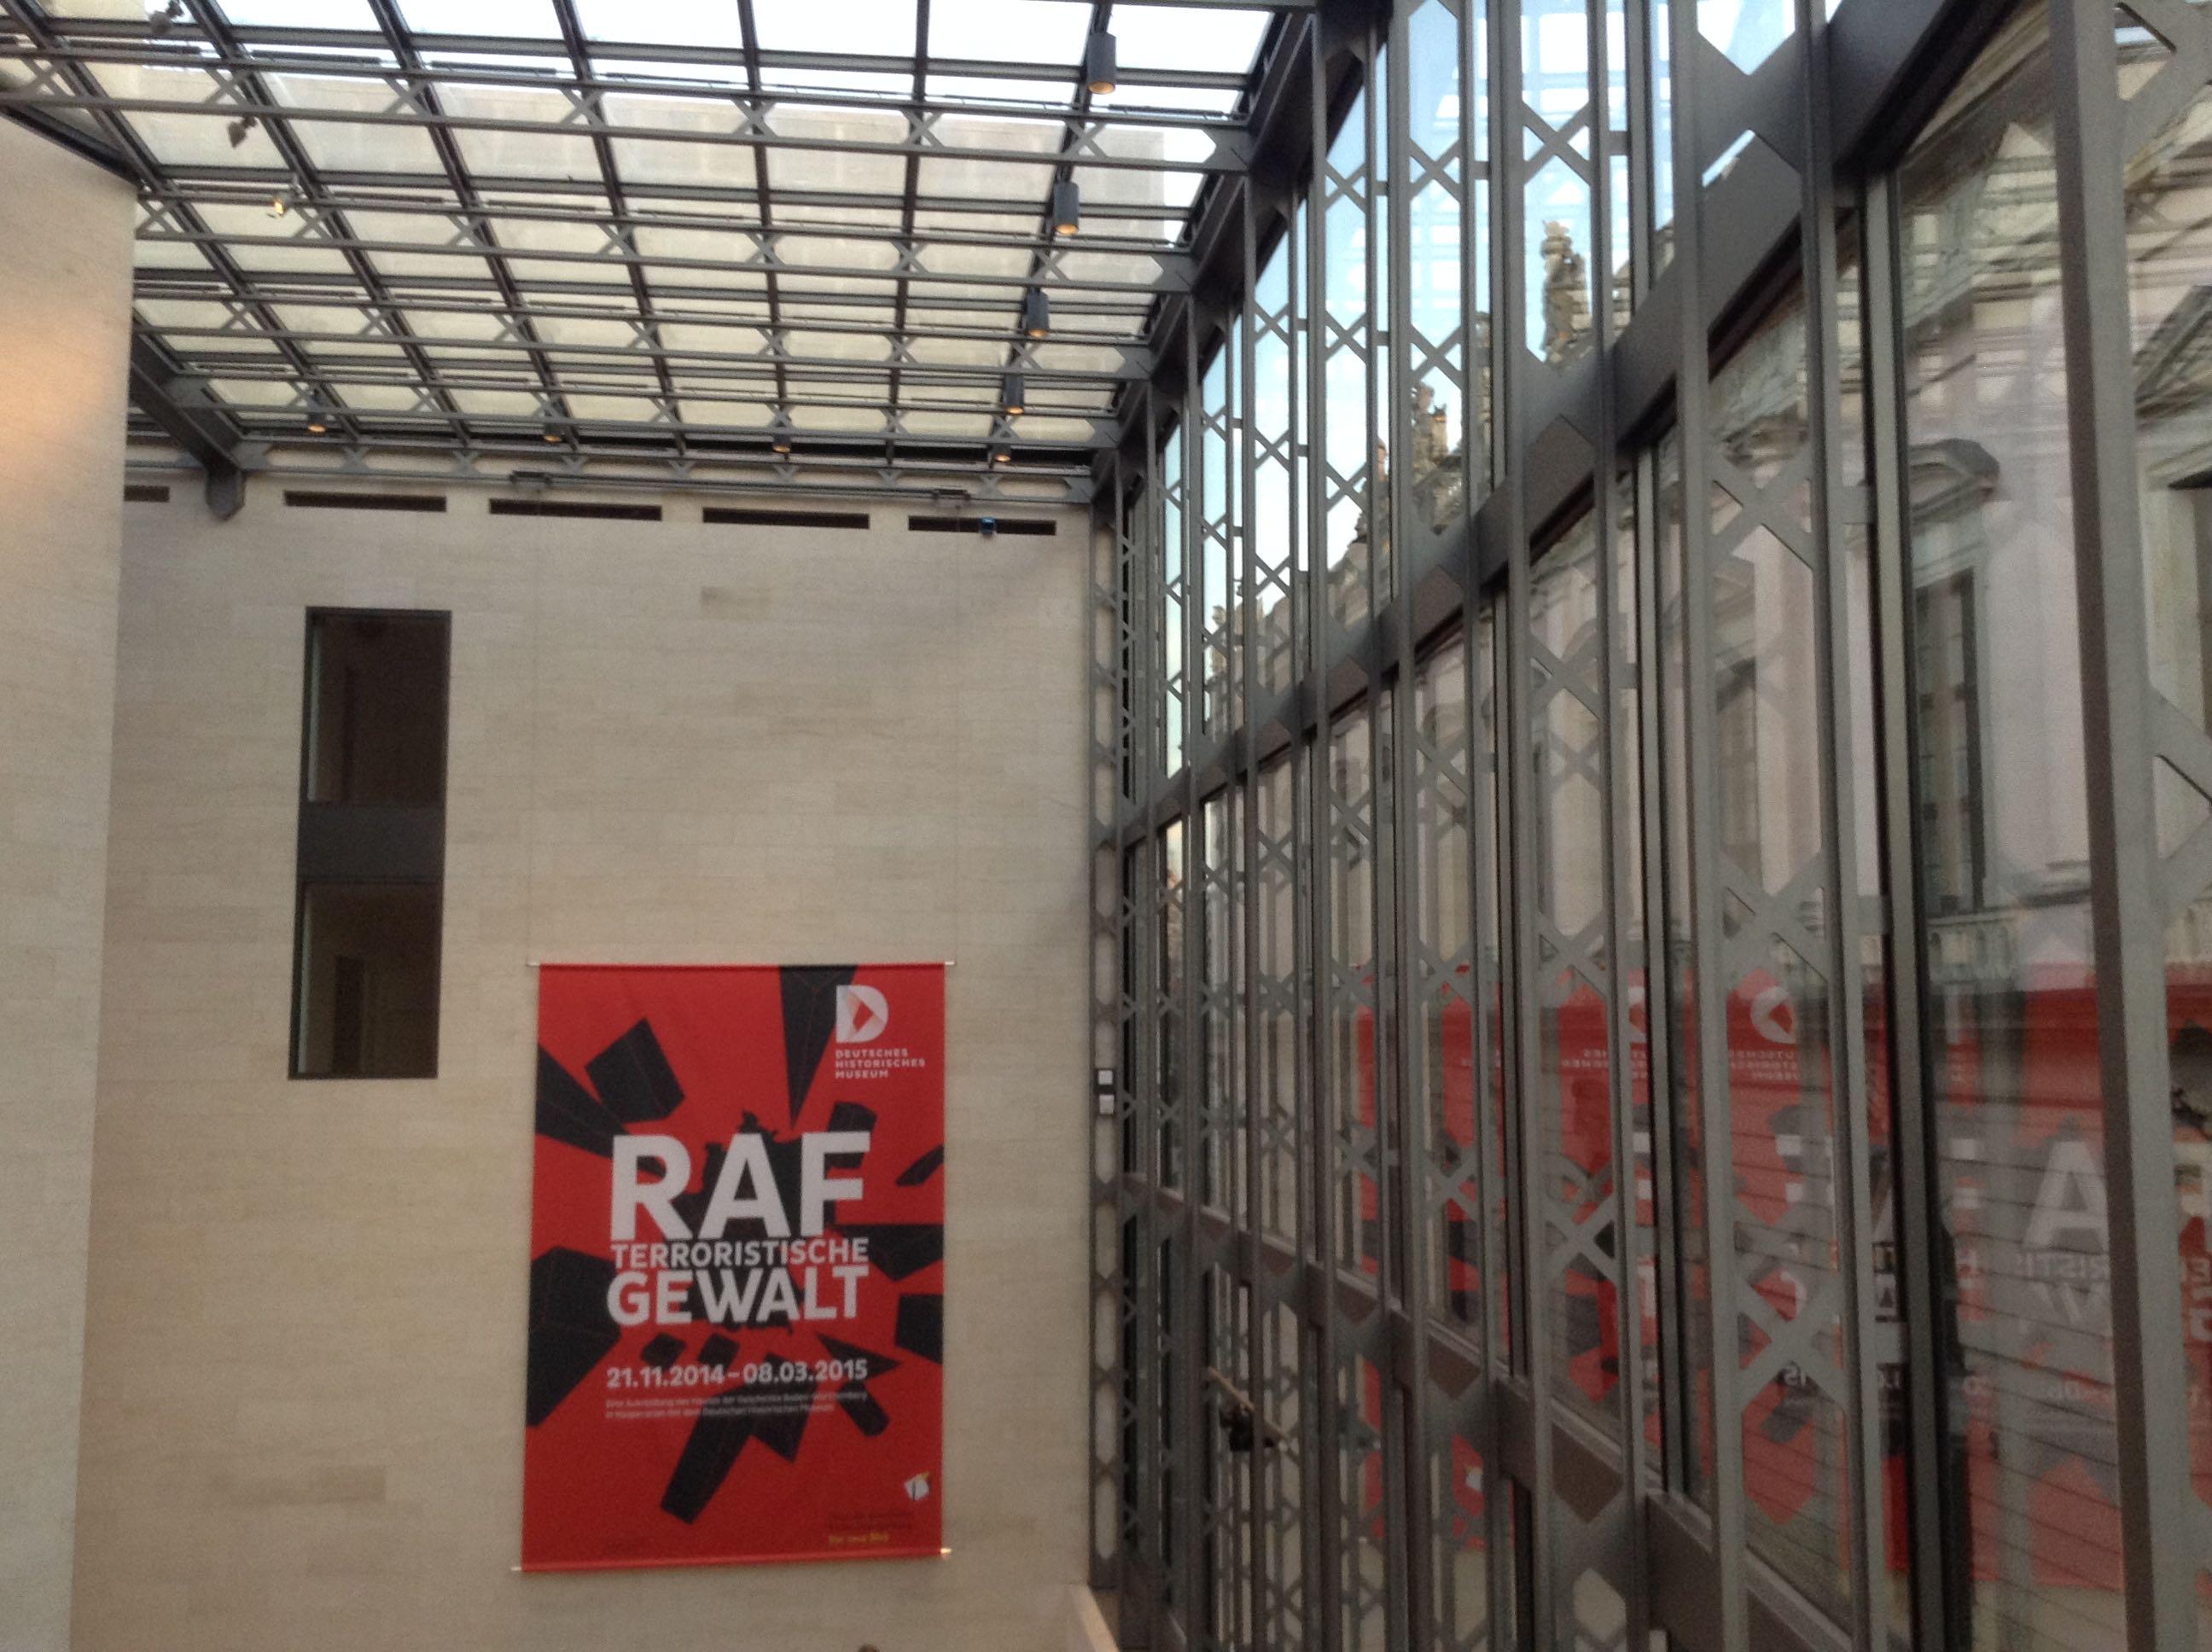 RAF Berlin